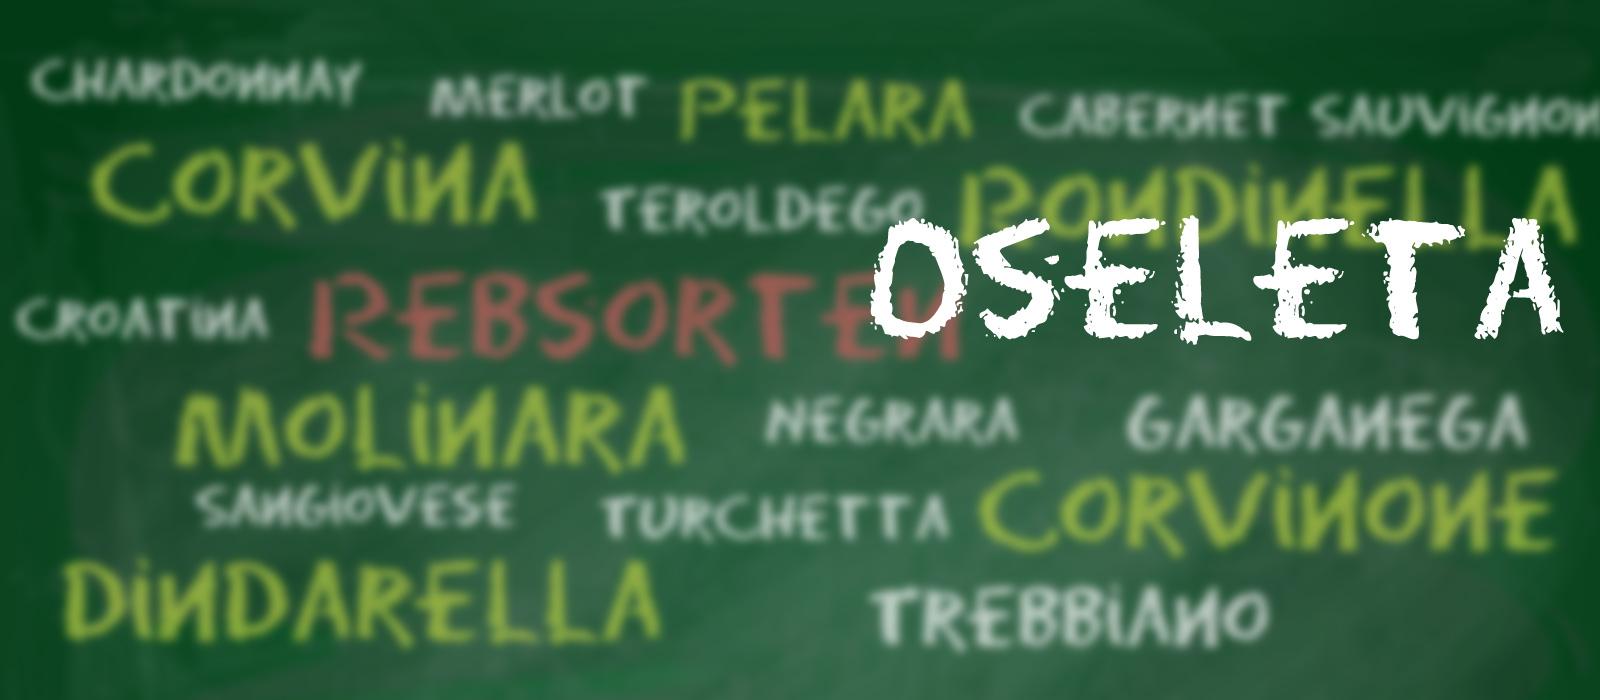 Rebsorte Oseleta